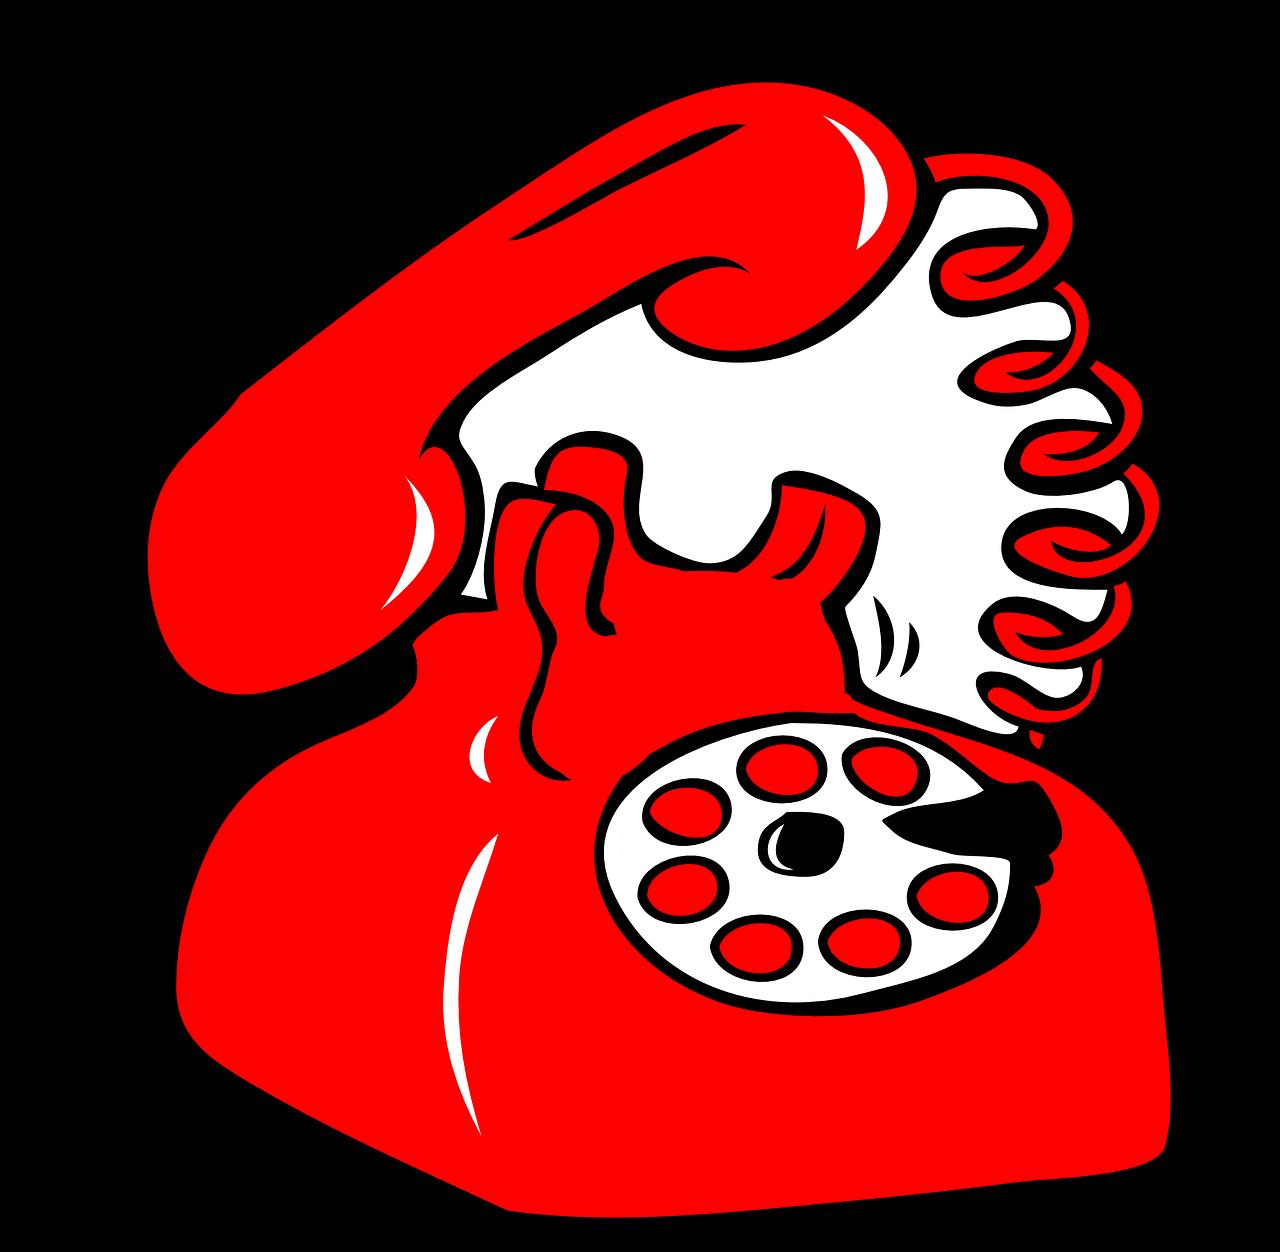 Clipart telephone old school. Lake effect creative blog